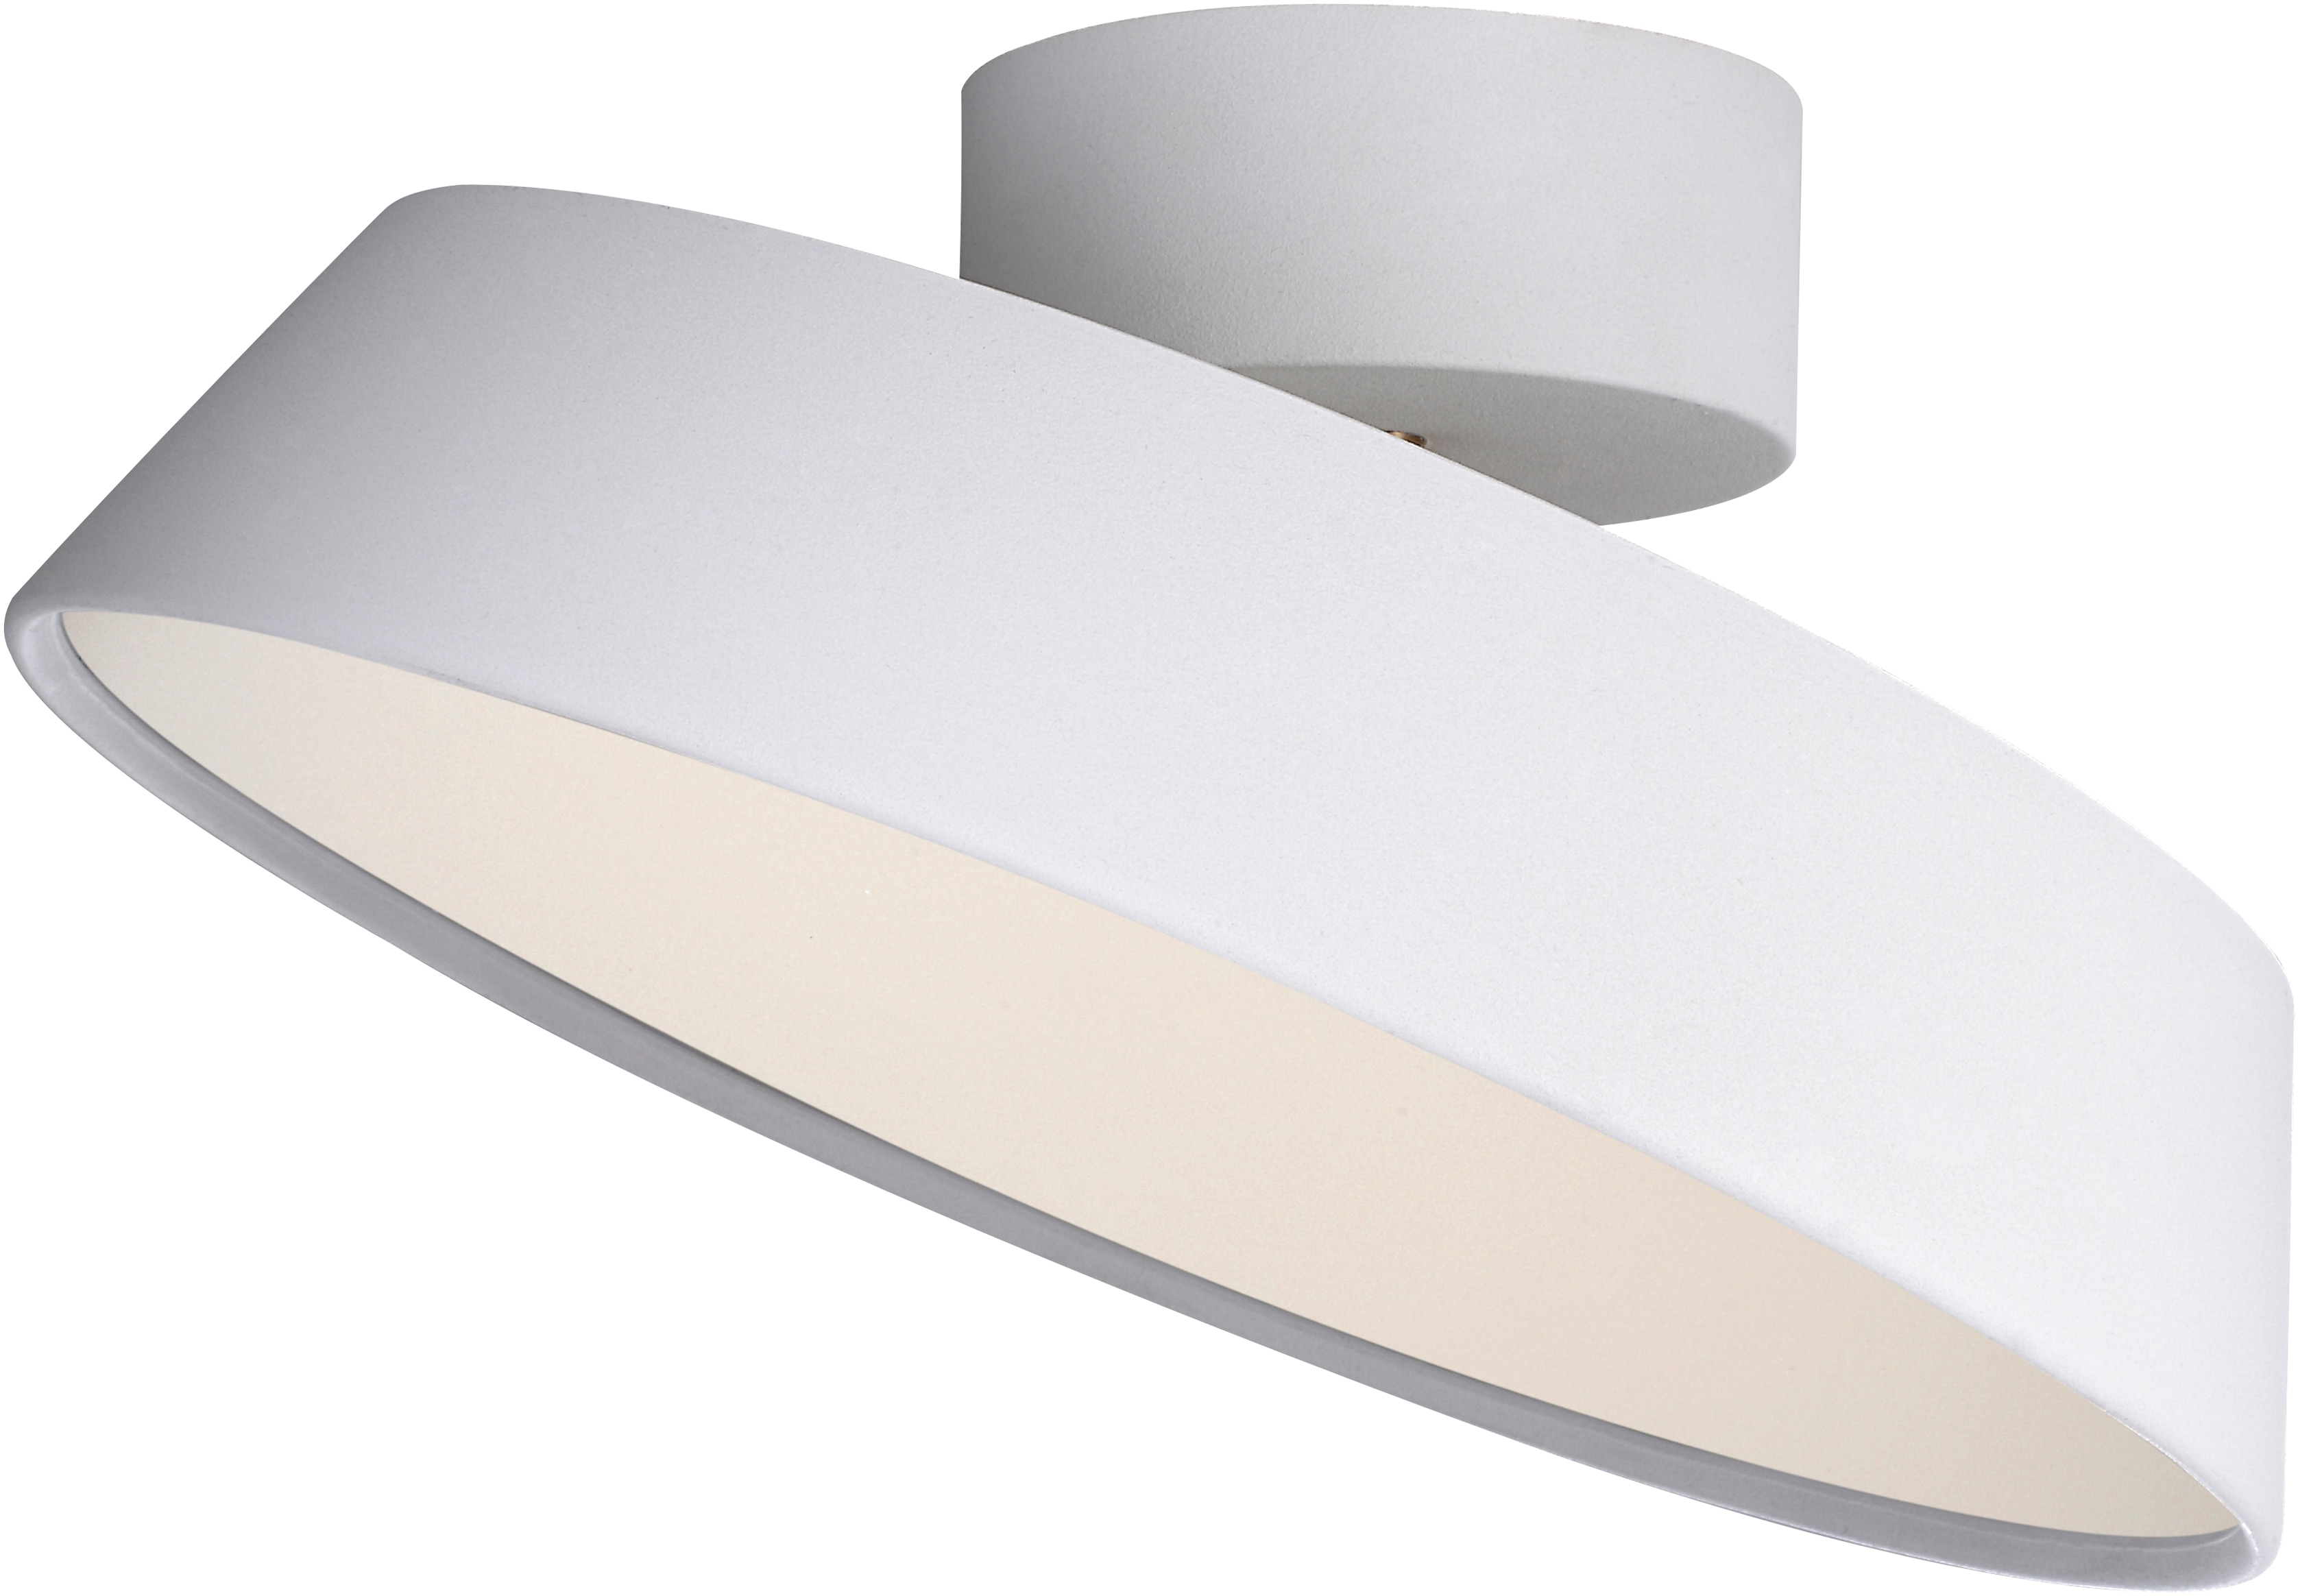 design for the people LED Deckenleuchte ALBA, LED-Modul, Warmweiß, Dimmbar, inkl.LED Modul 12W, Stromsparend, Langlebig, Schirm schwenkbar